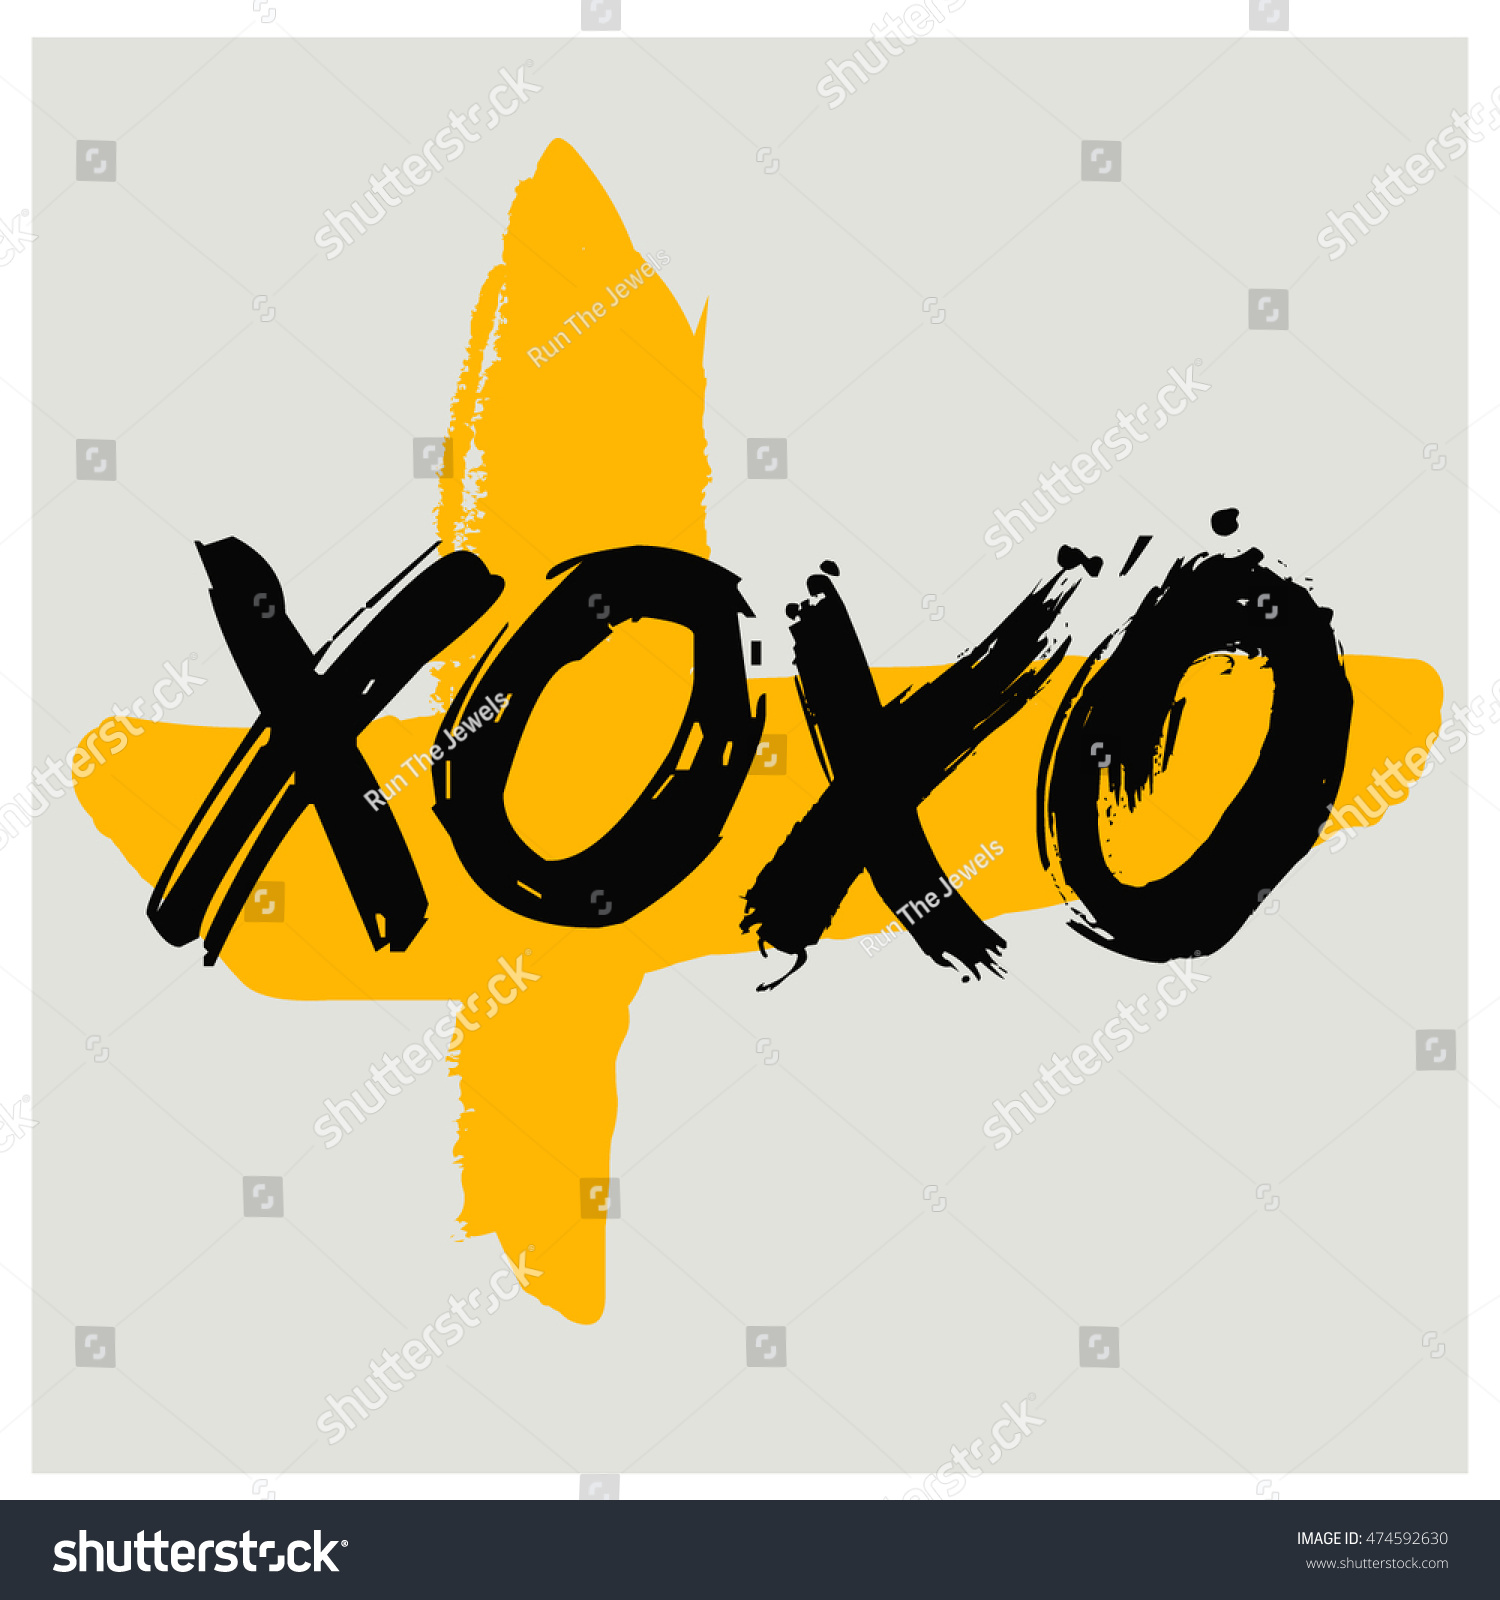 Hugs symbol in text messaging